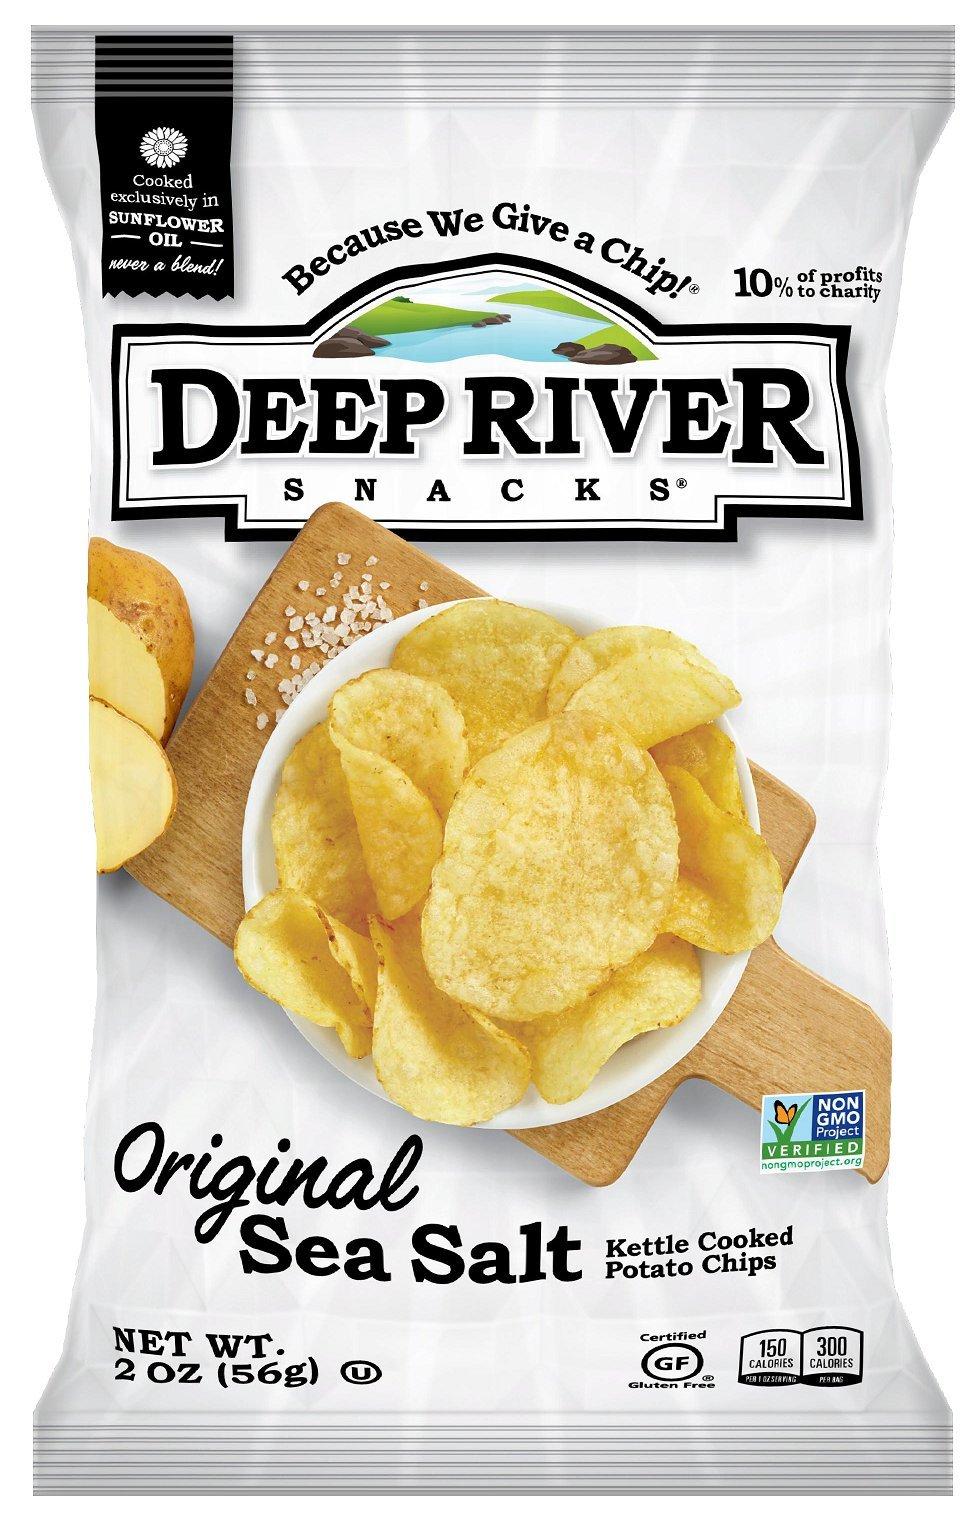 Deep River Snacks Original Sea Salt Kettle Cooked Potato Chips, 2-Ounce (Pack of 24)